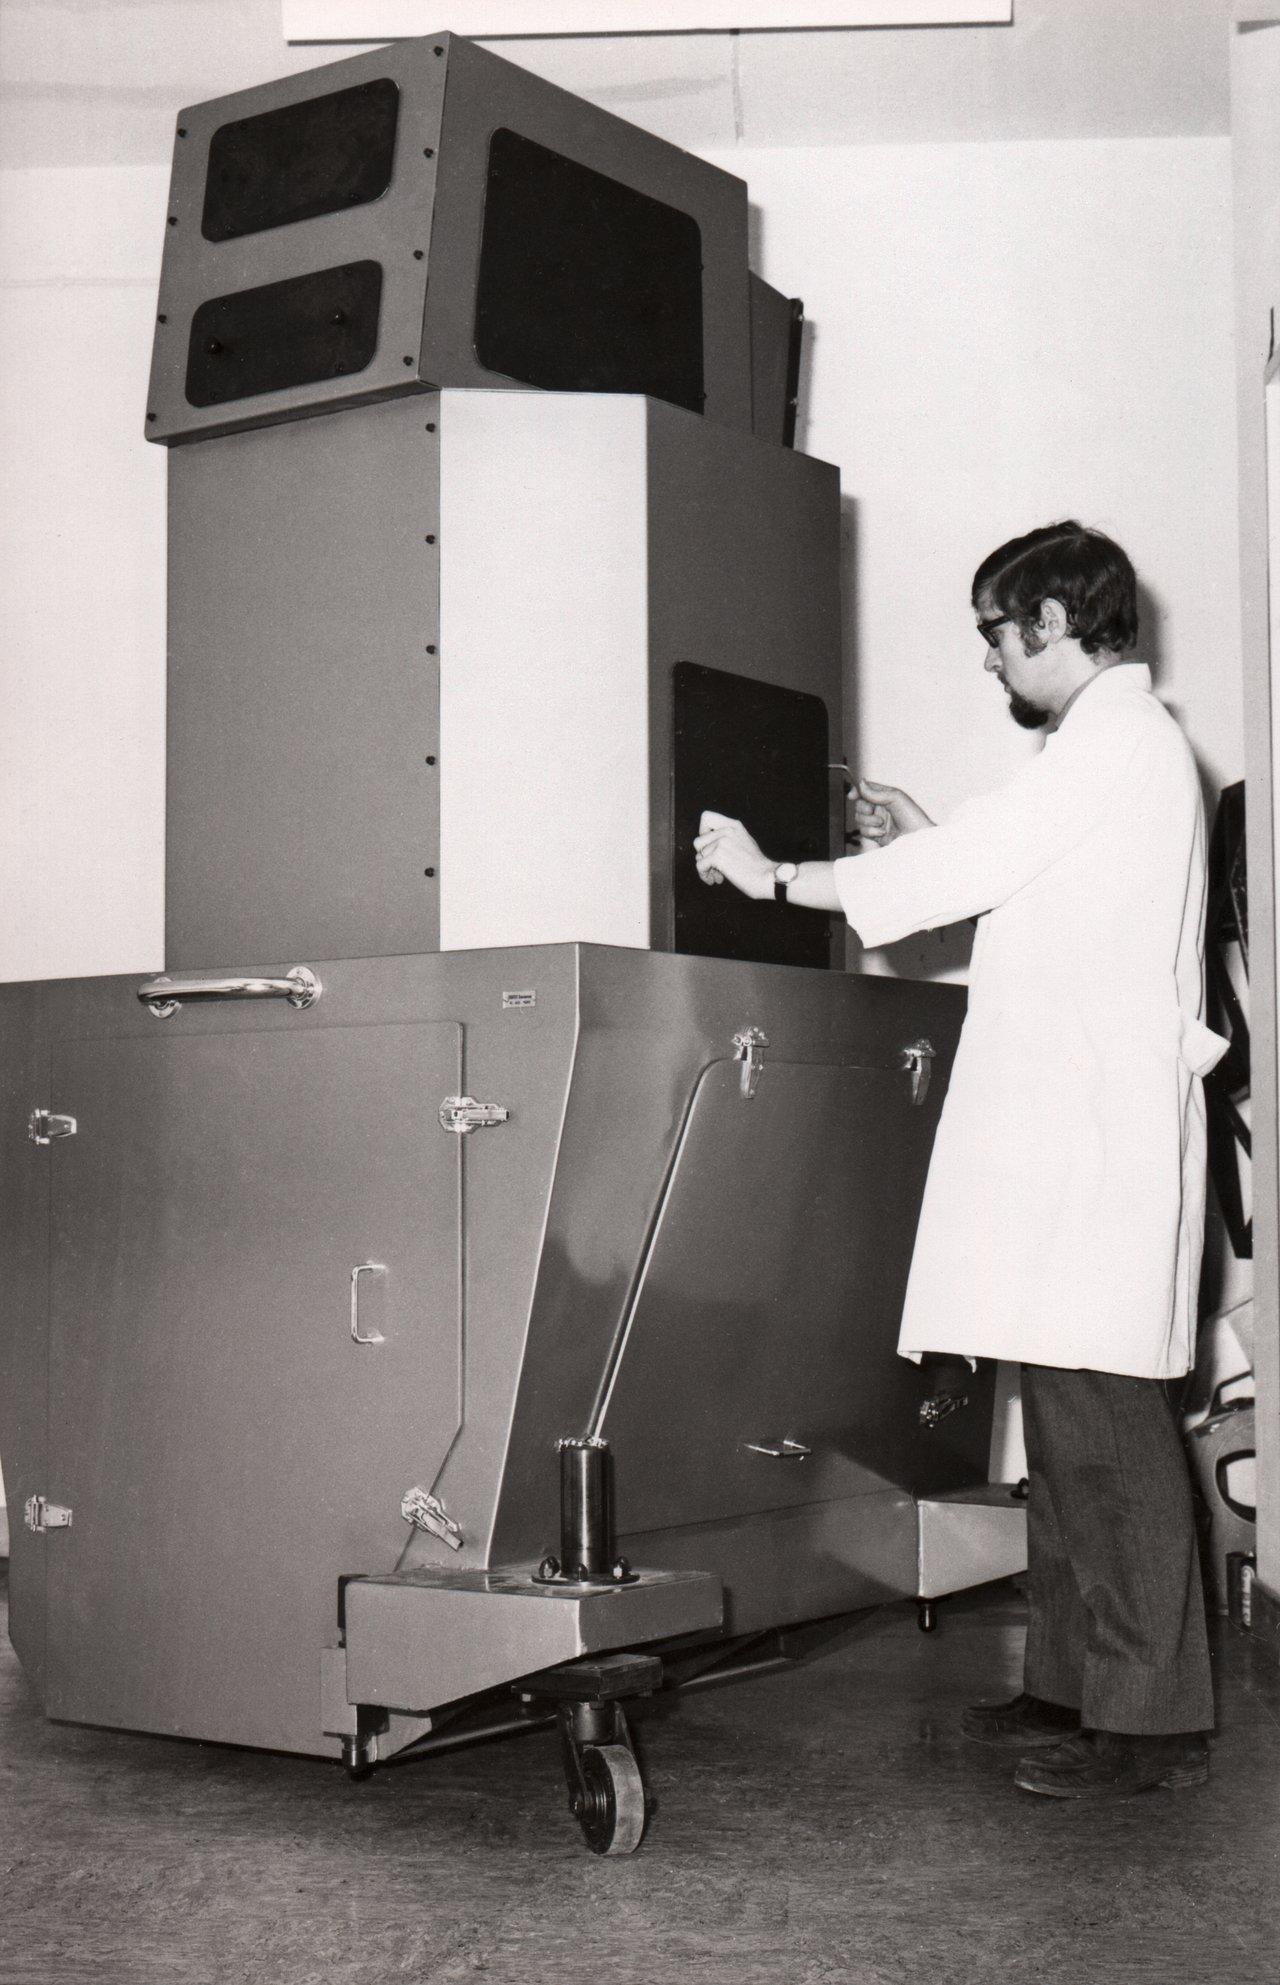 Echelle spectrograph